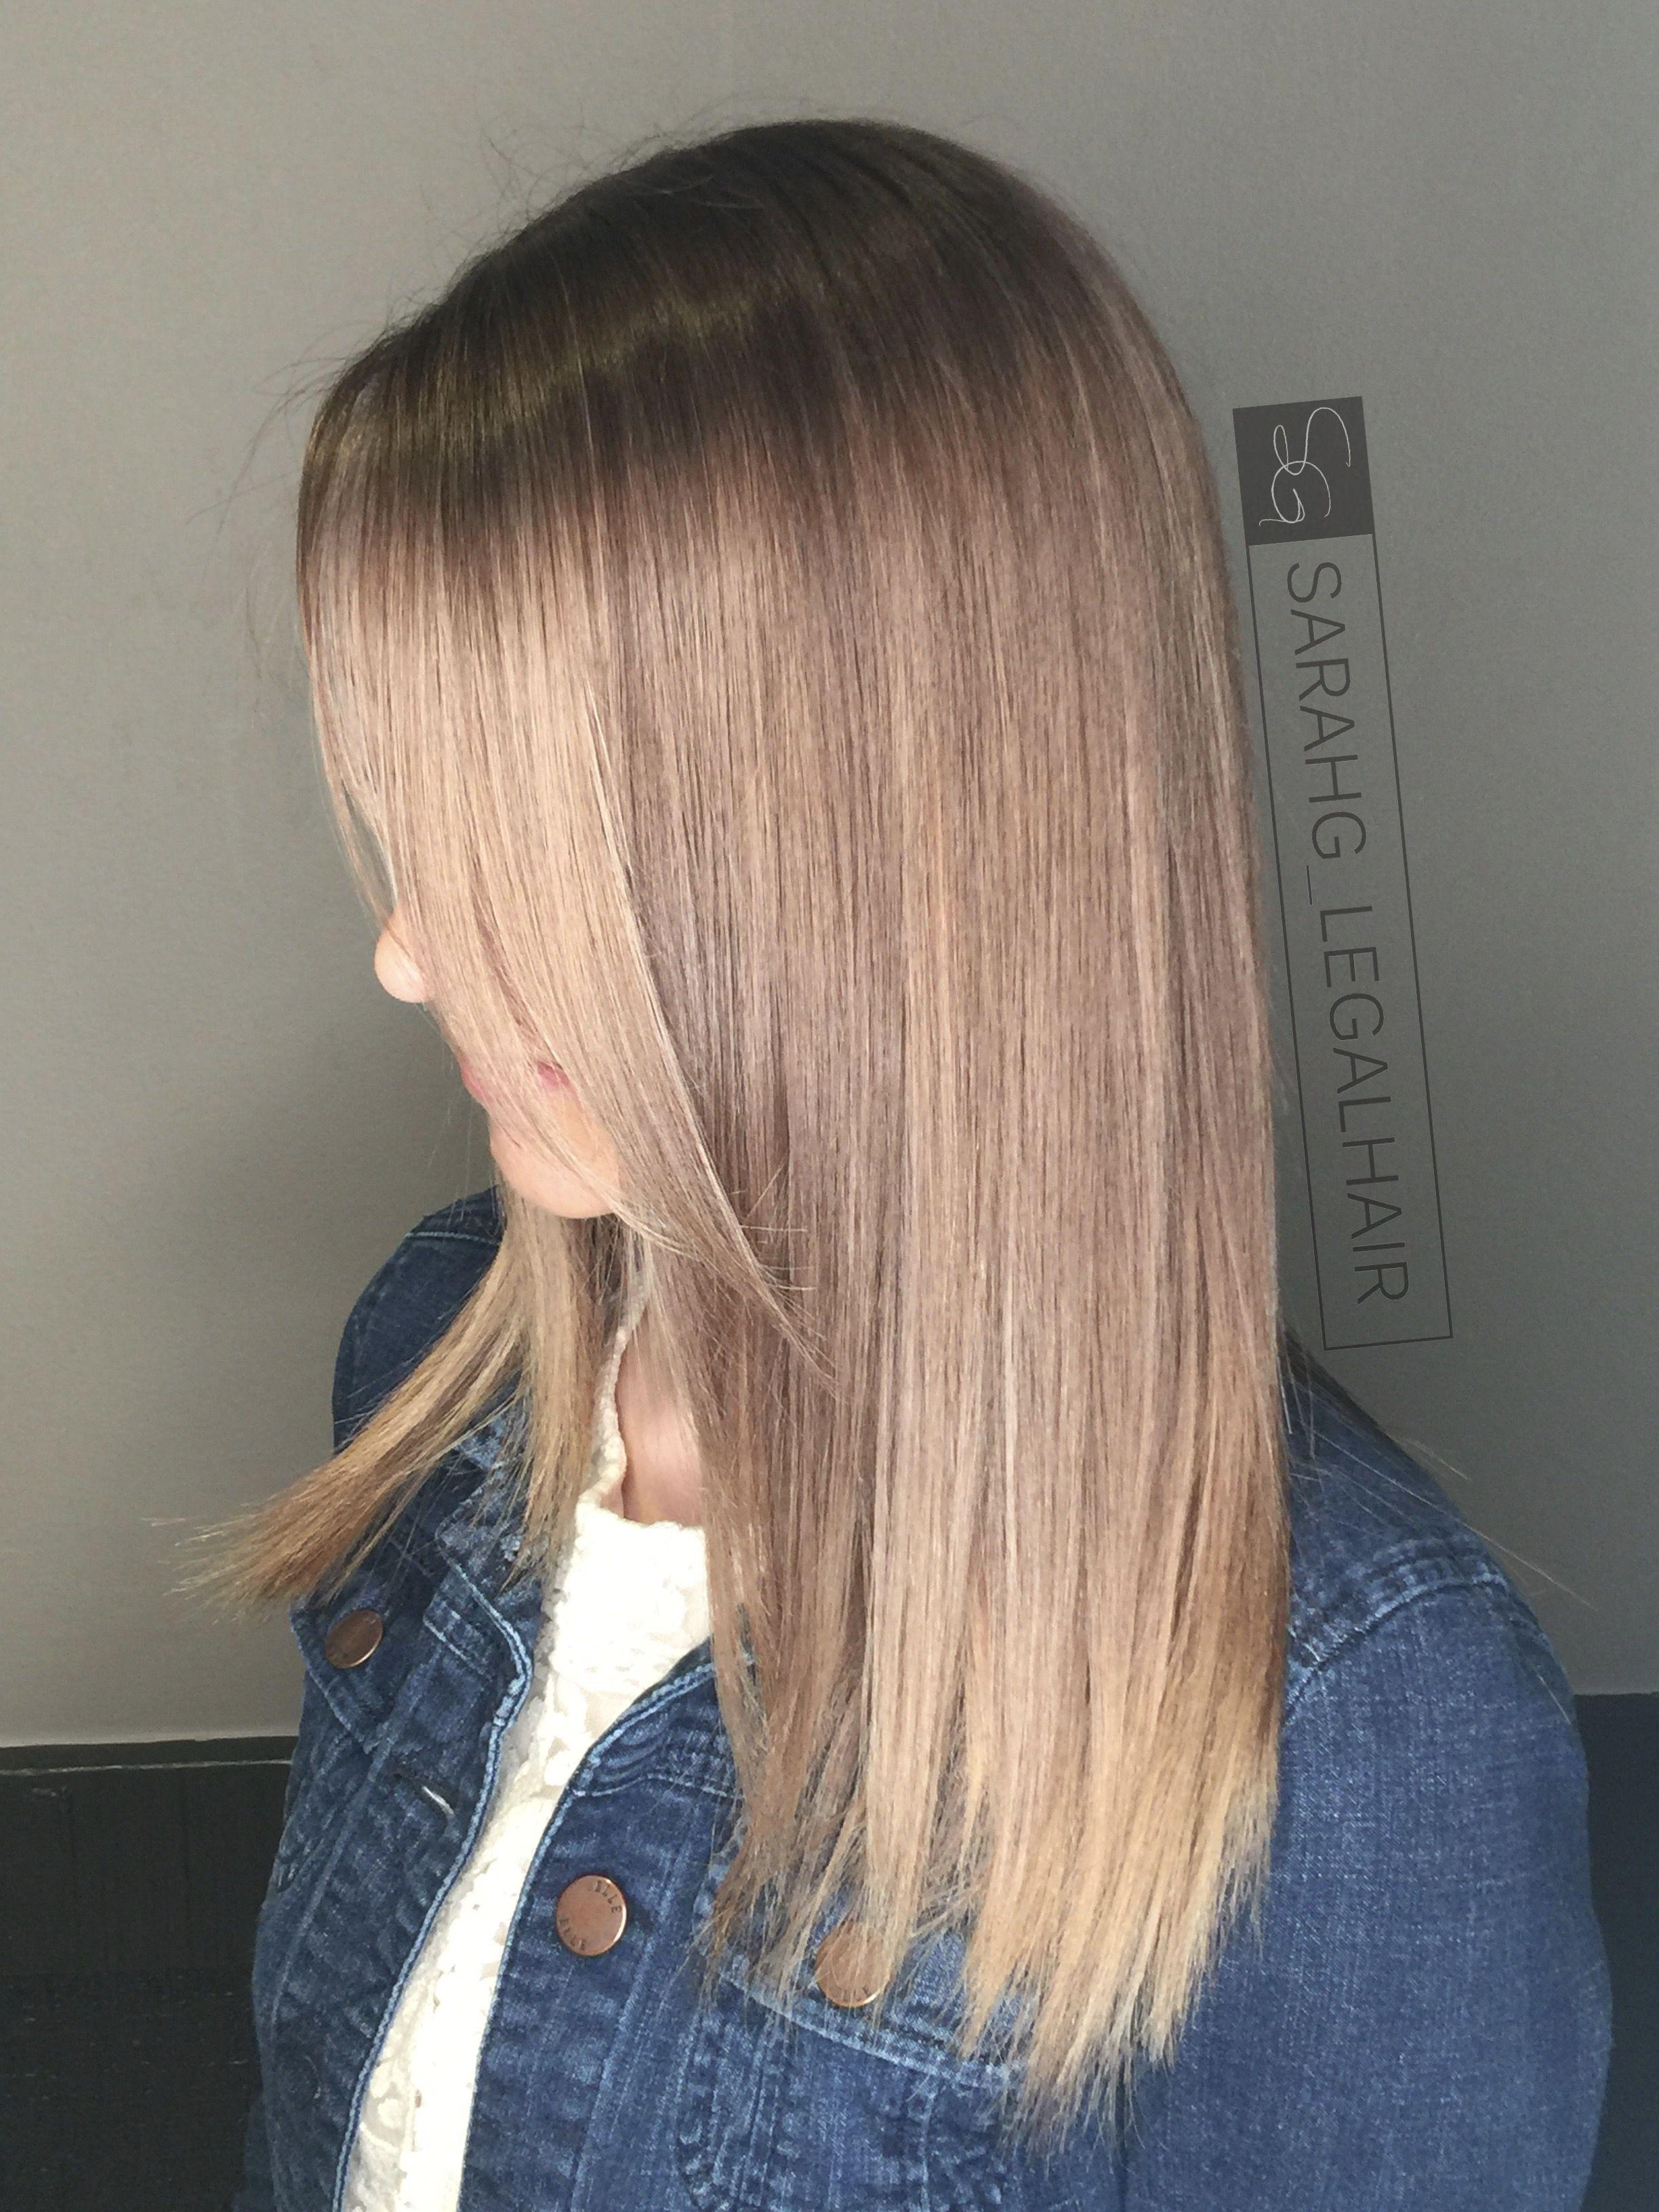 Babylights And Balayage Bronze Hair Natural Light Brown Dark